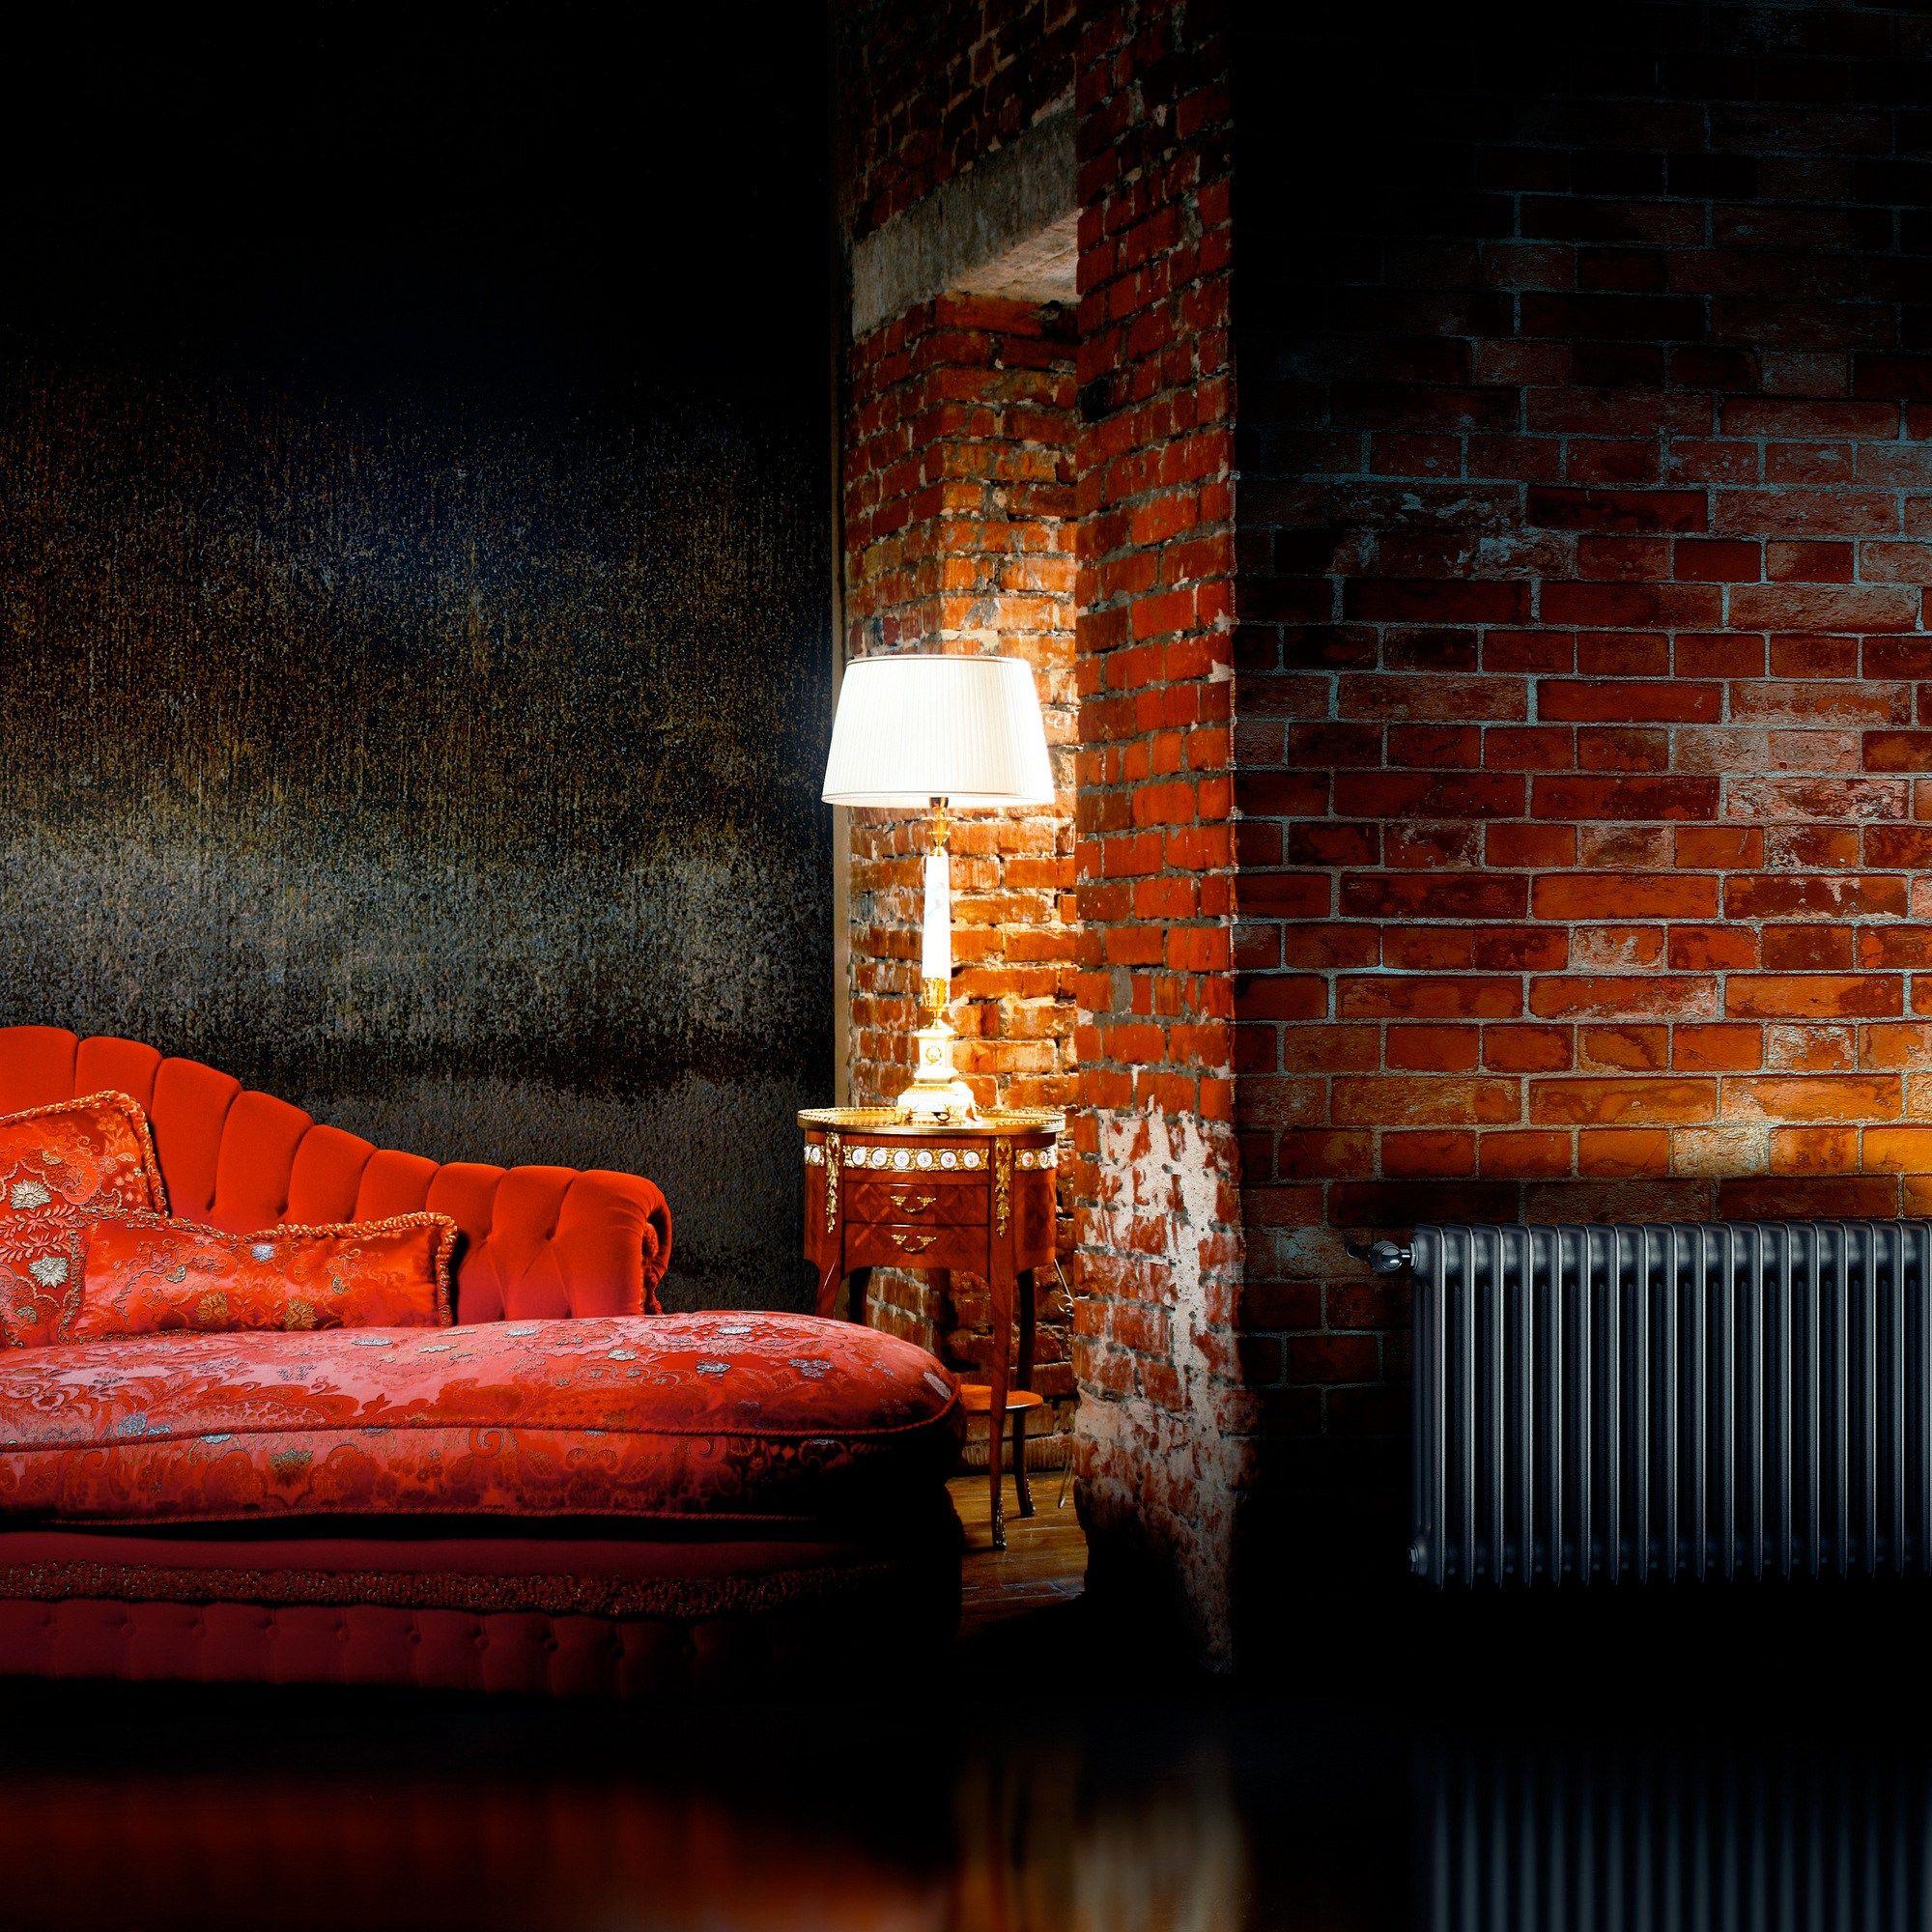 vintage style wall mounted steel decorative radiator. Black Bedroom Furniture Sets. Home Design Ideas